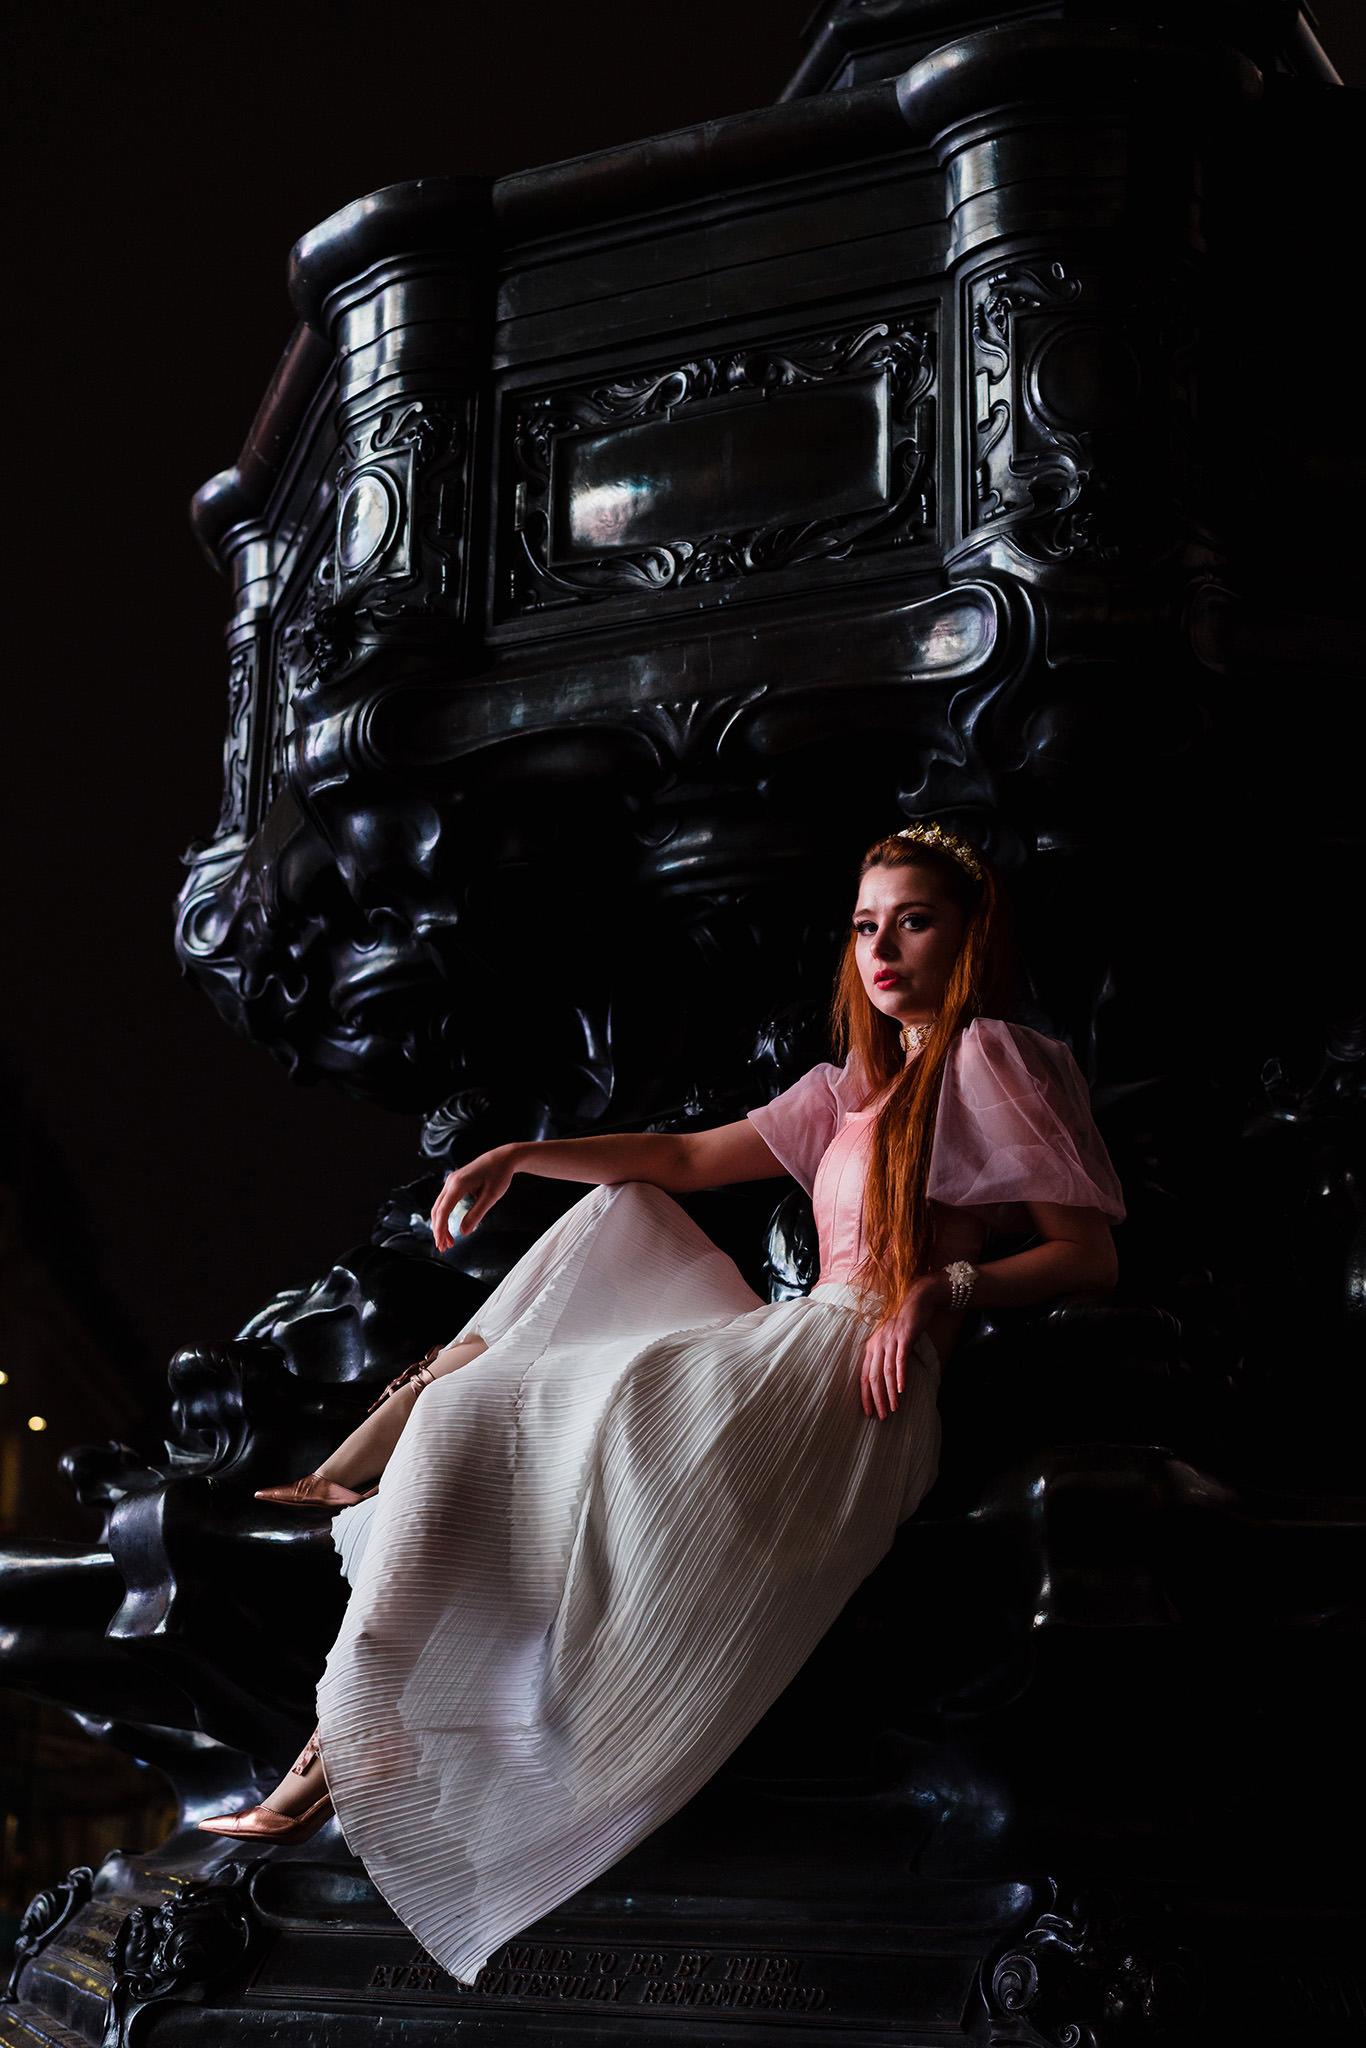 styled london portraits shoot